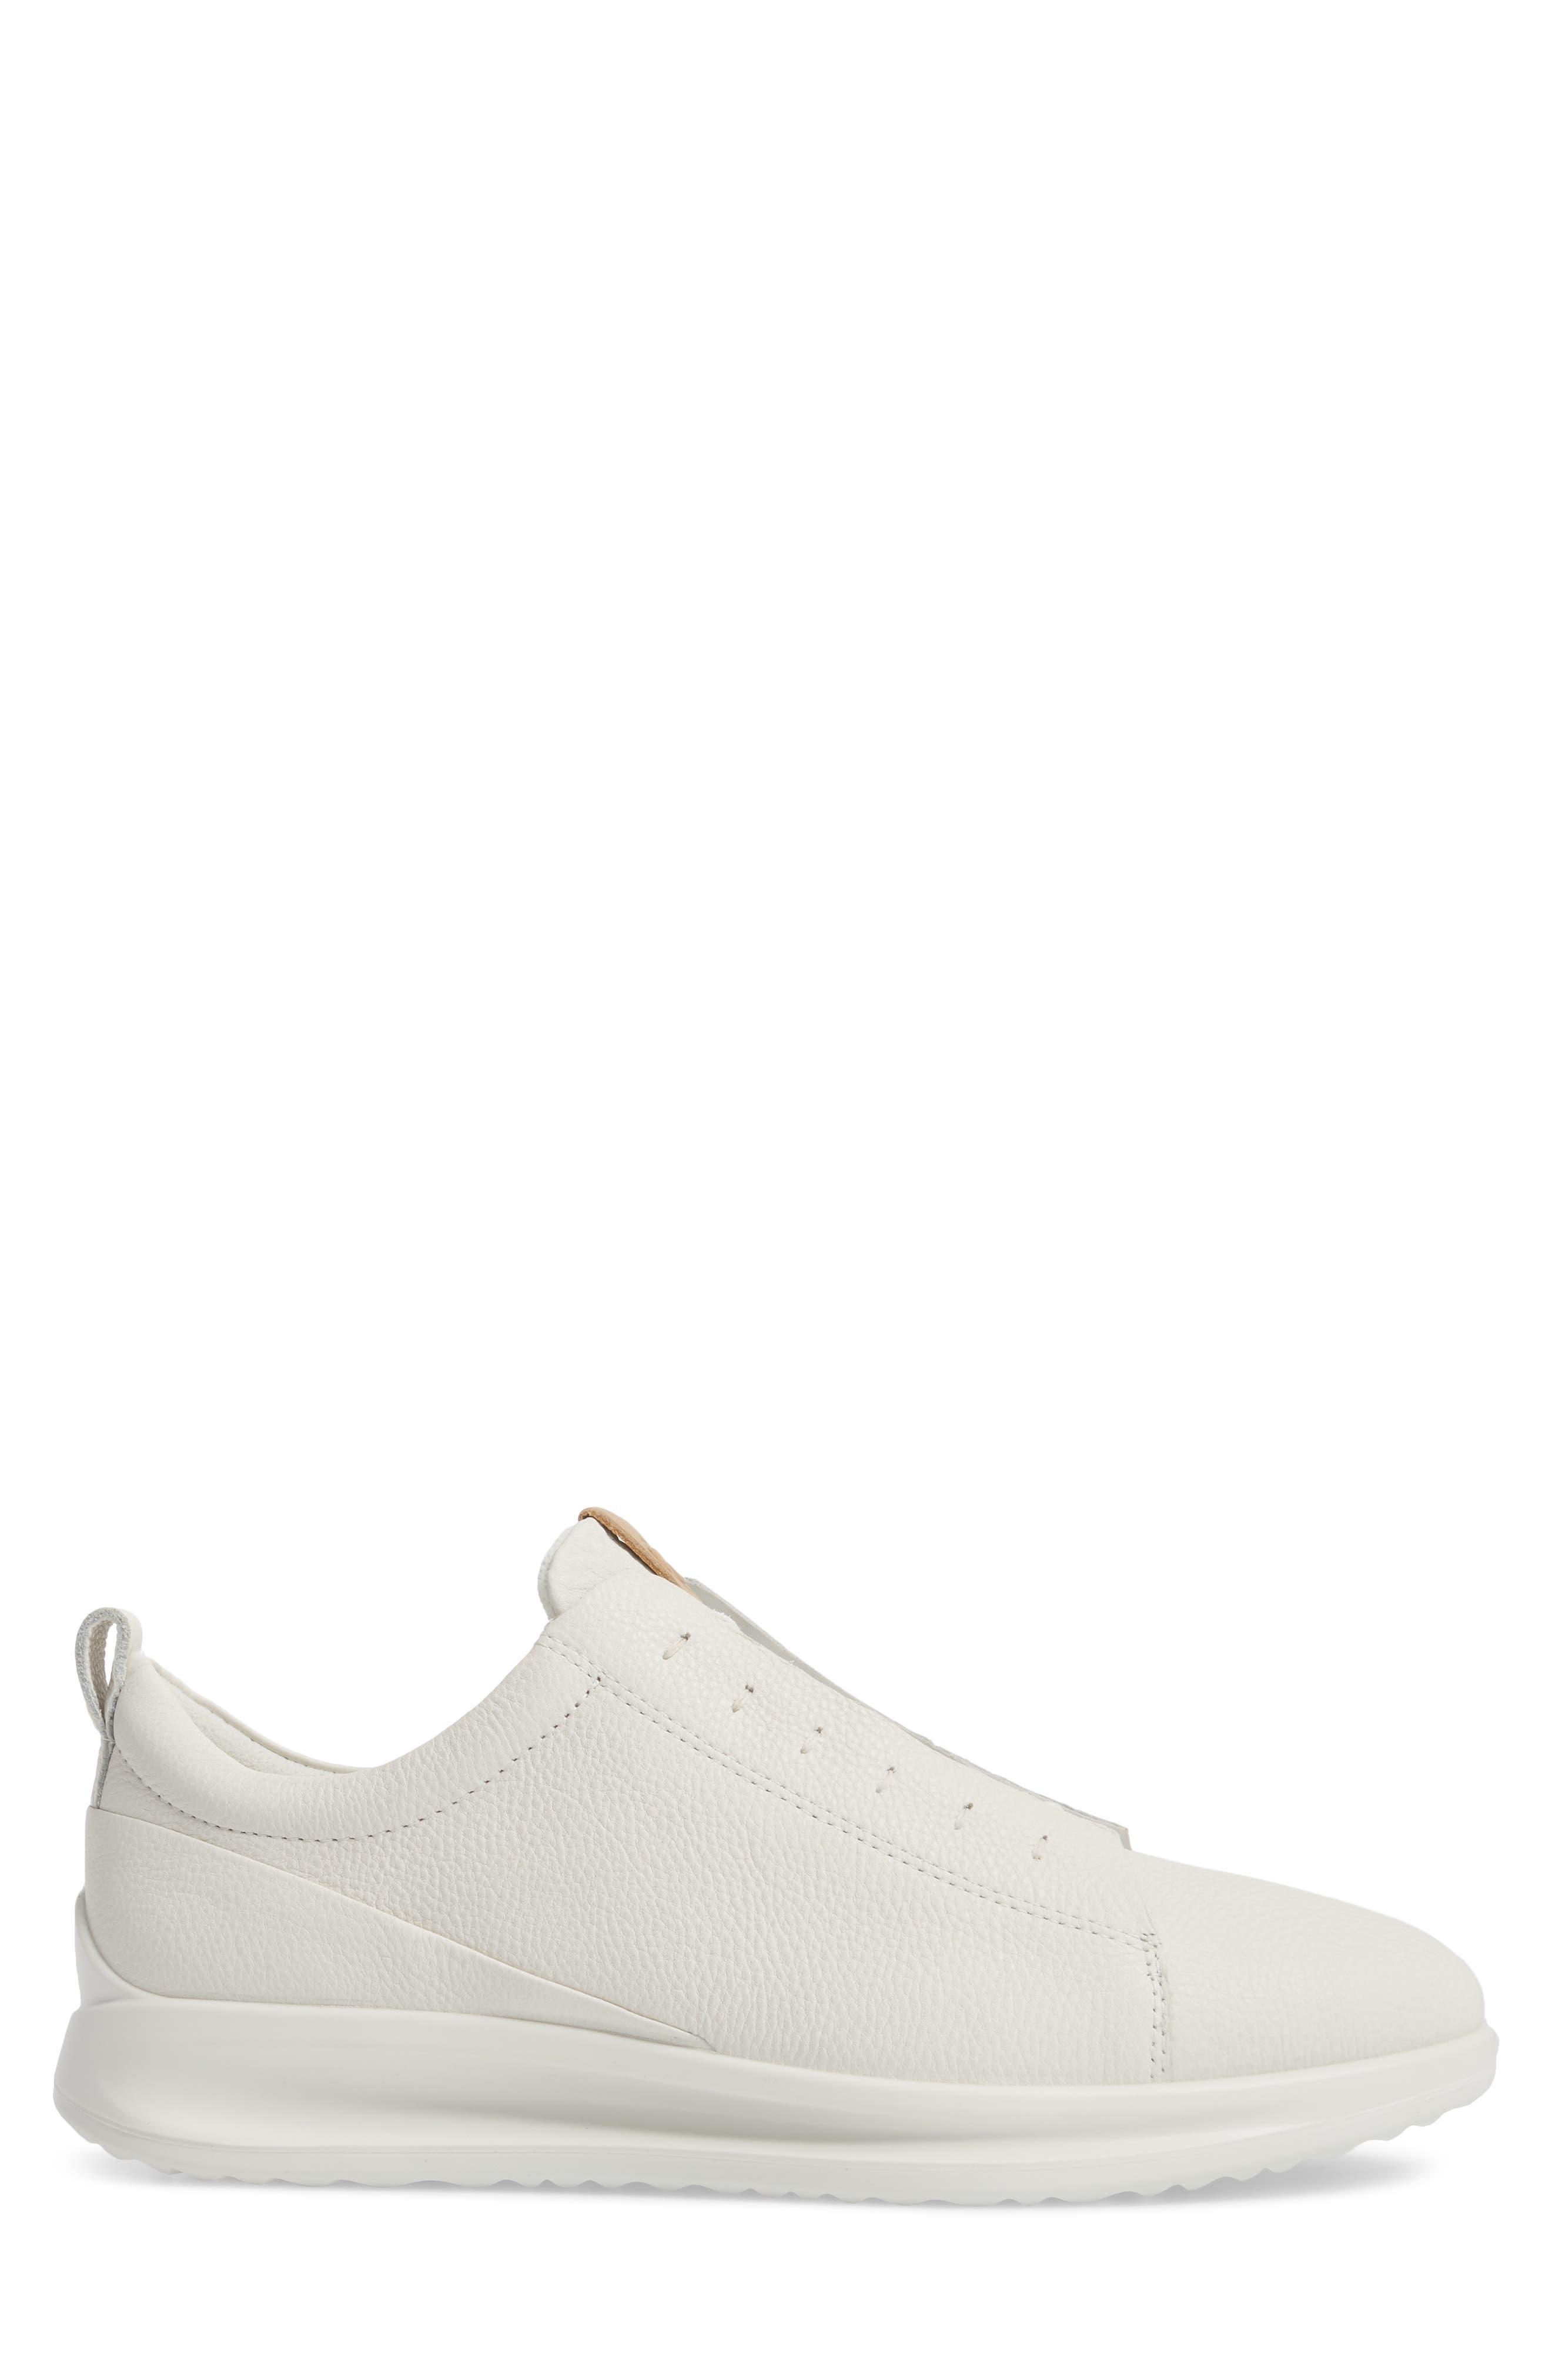 Aquet Low Top Sneaker,                             Alternate thumbnail 3, color,                             White Leather